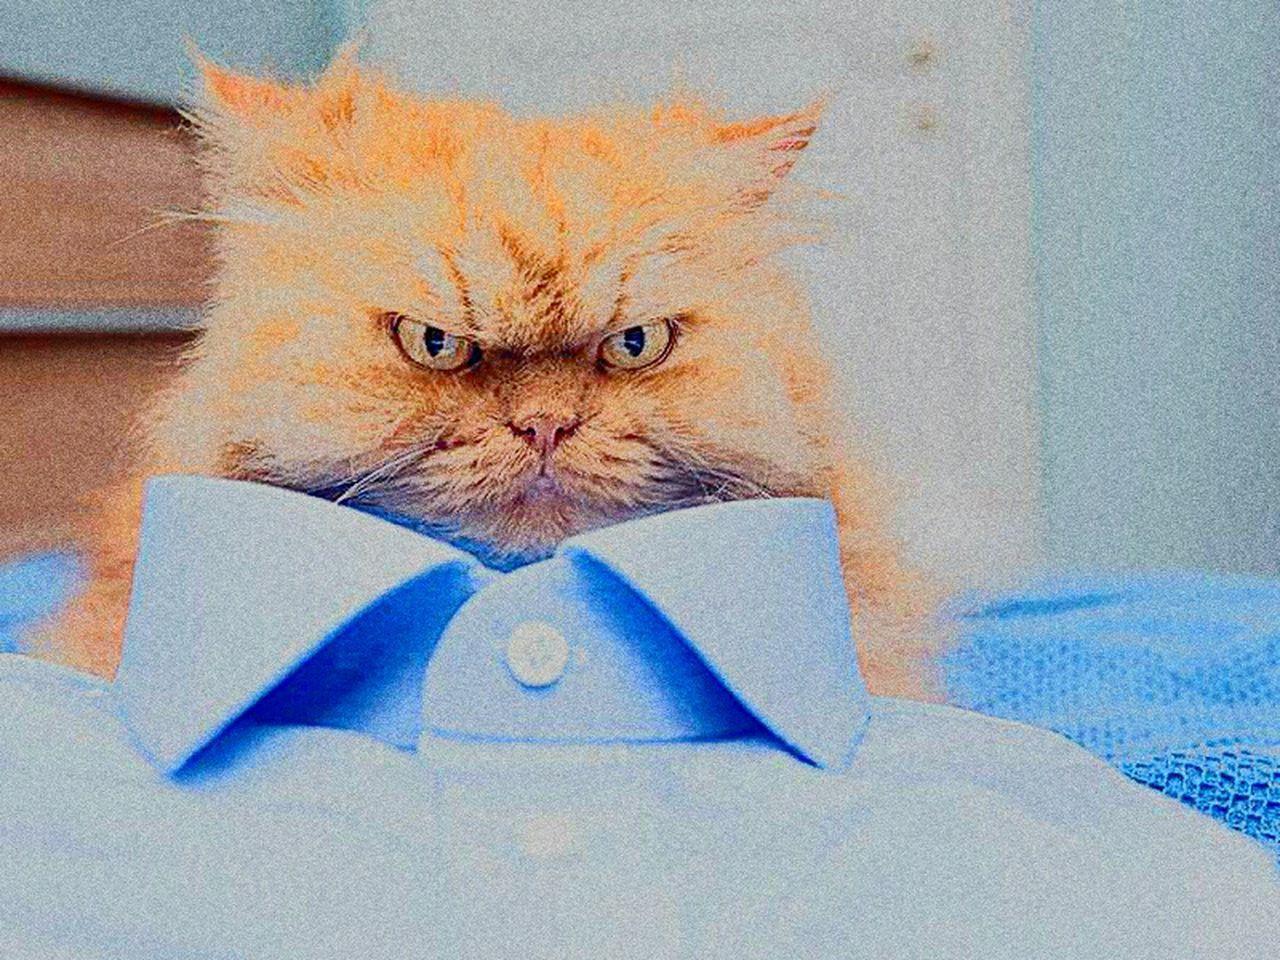 Angry cat Domestic Cat Pets Persian Cat  Cat Cats Cat♡ Cat Lovers Cats Of EyeEm Cats 🐱 Cat Eyes Cateyes Catsoftheworld Angry Cat. EyeEmNewHere Facial Expression Persian Cat  Newyork London Paris Pakistan China Facebook Archival Portrait Feline